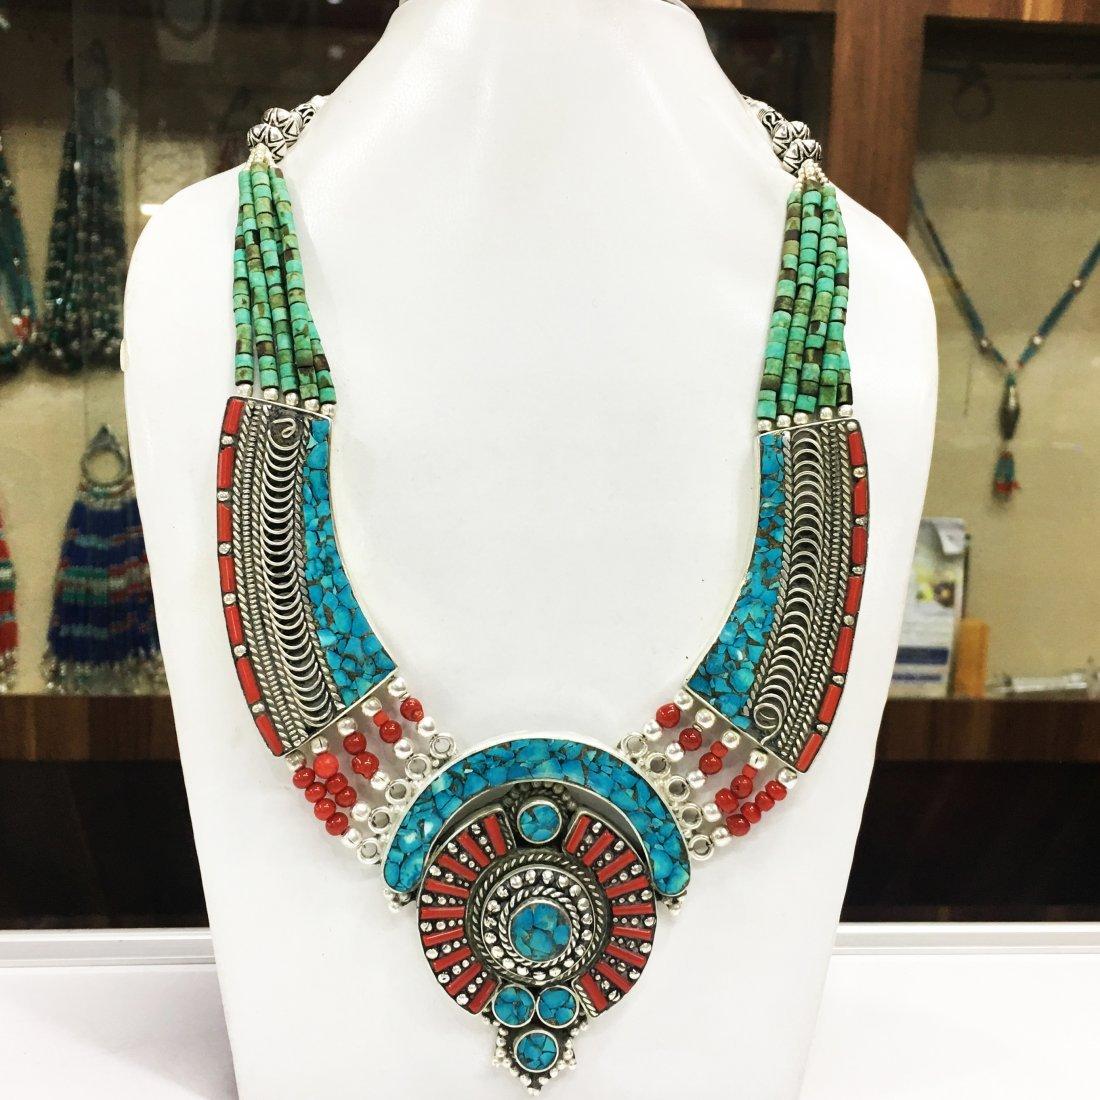 Ethnic Turquoise Bohemian Vintage Necklace